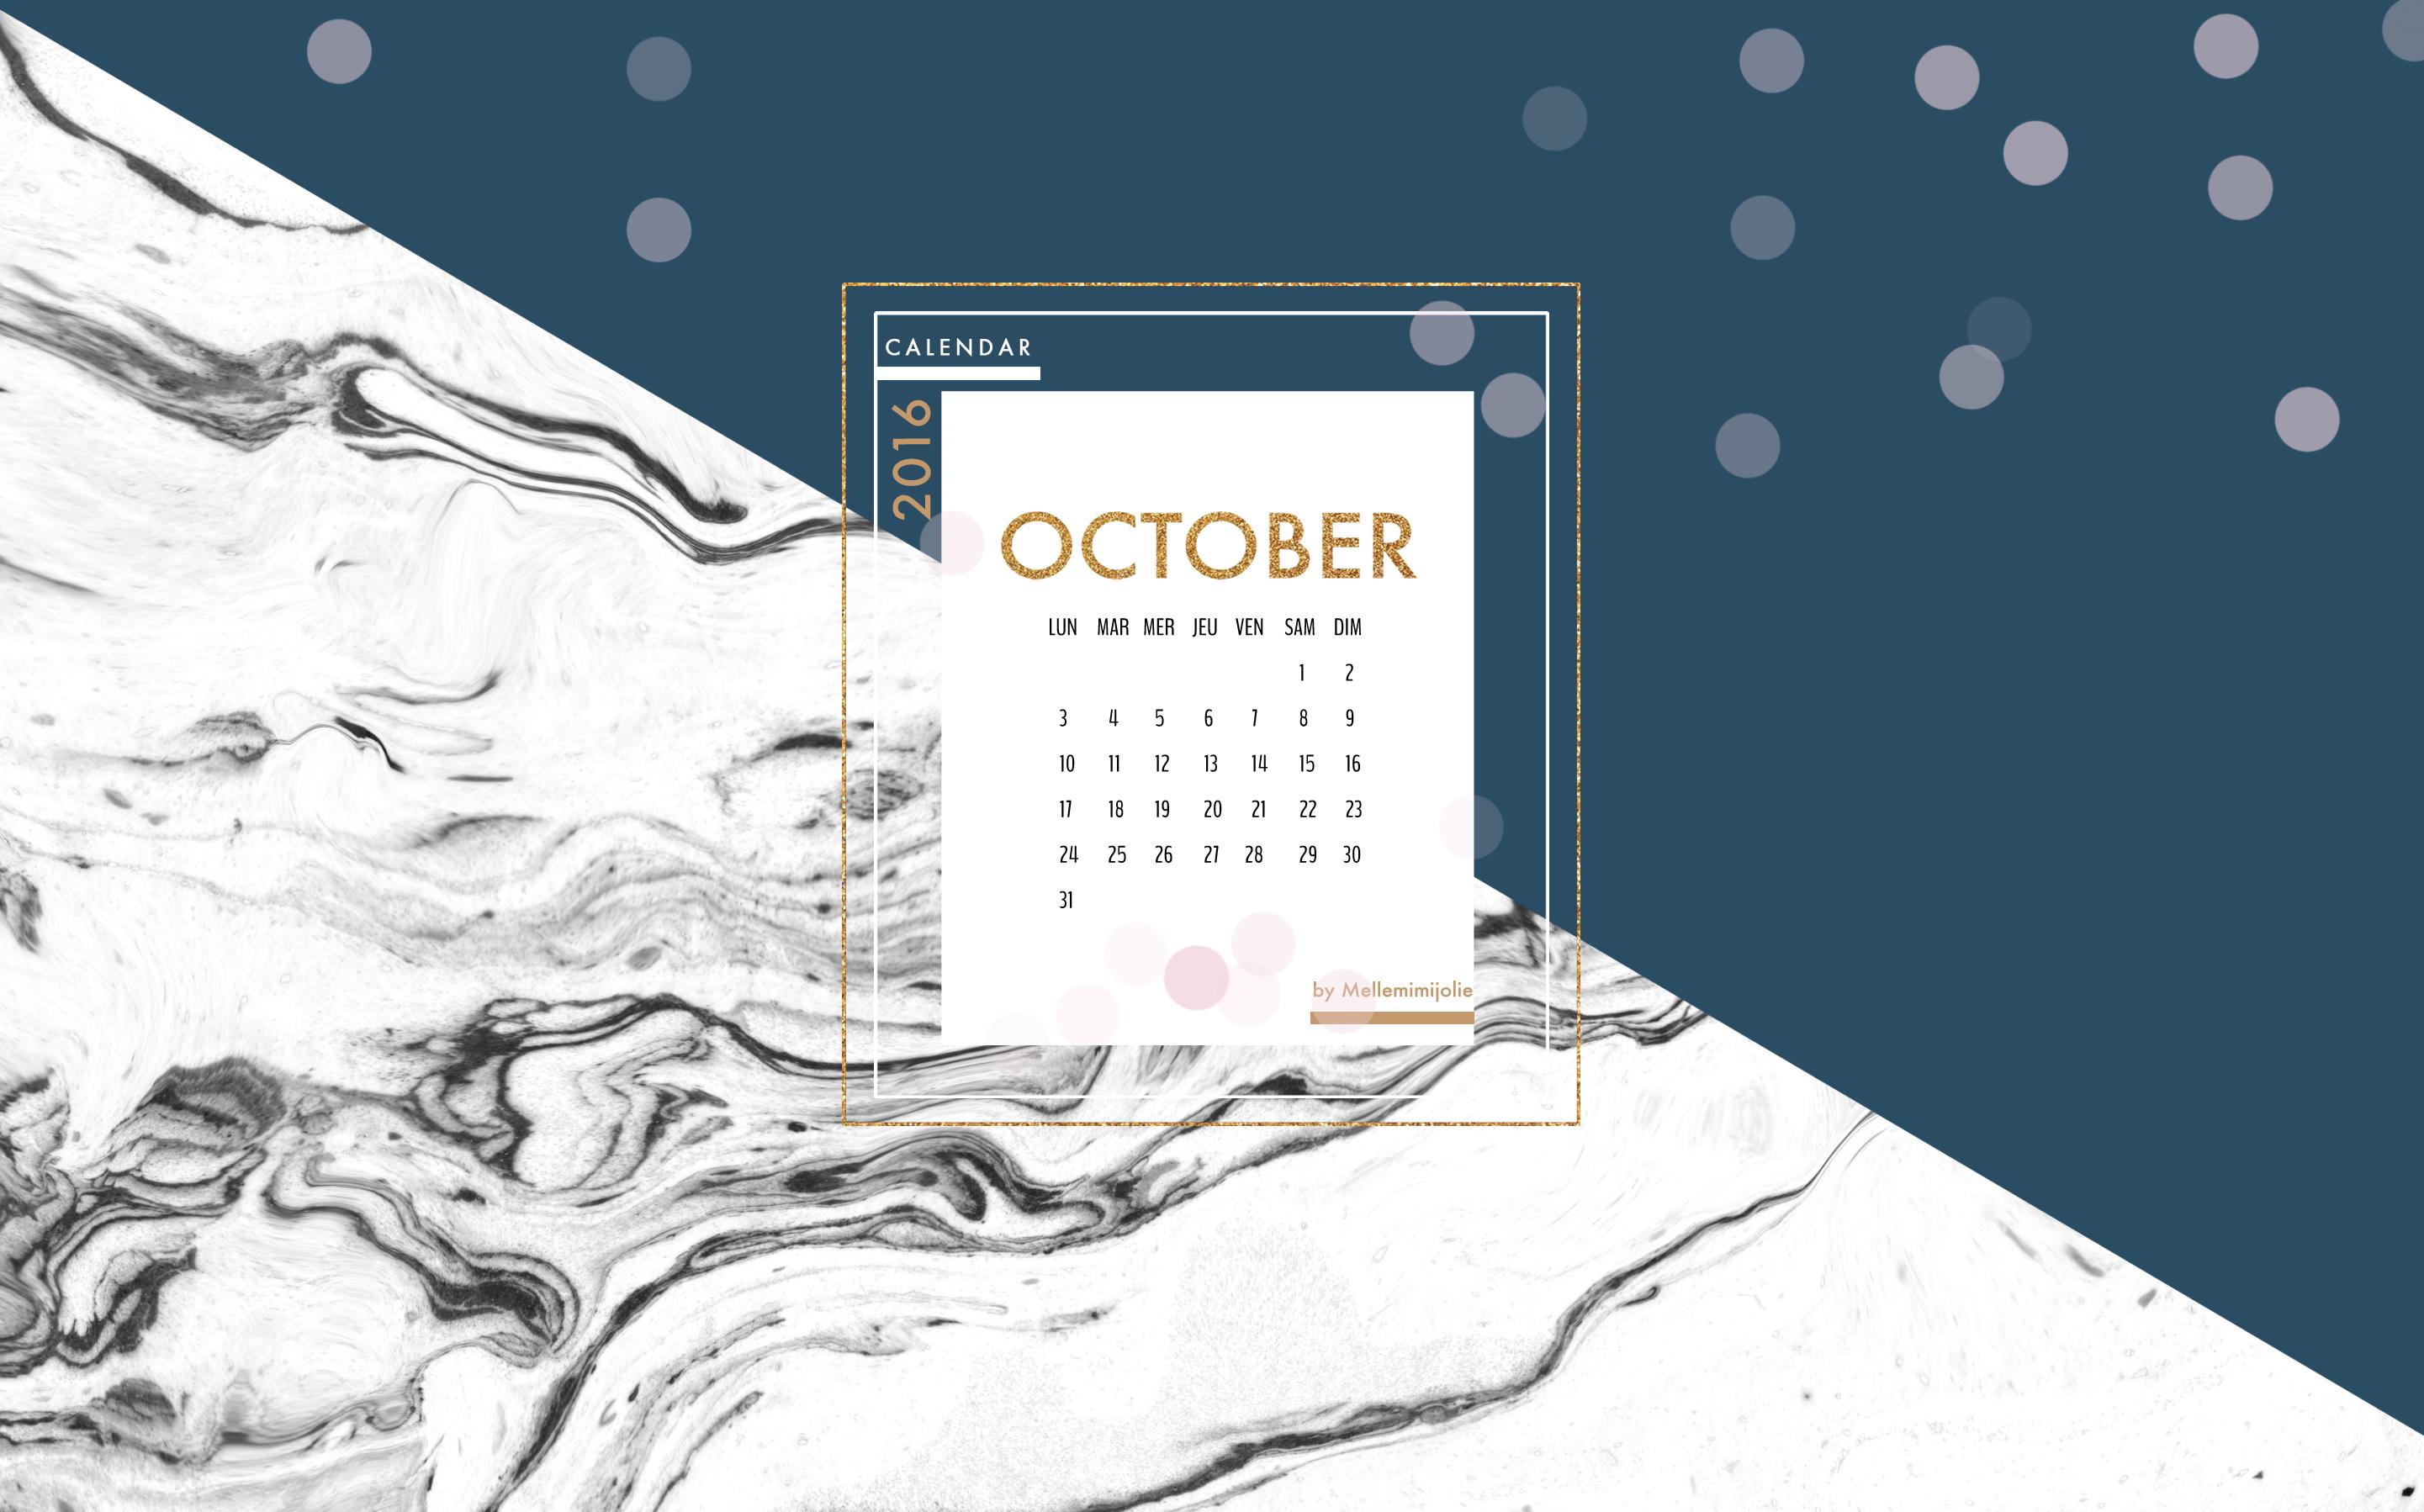 calendrier-marble-octobre-mellemimijolie